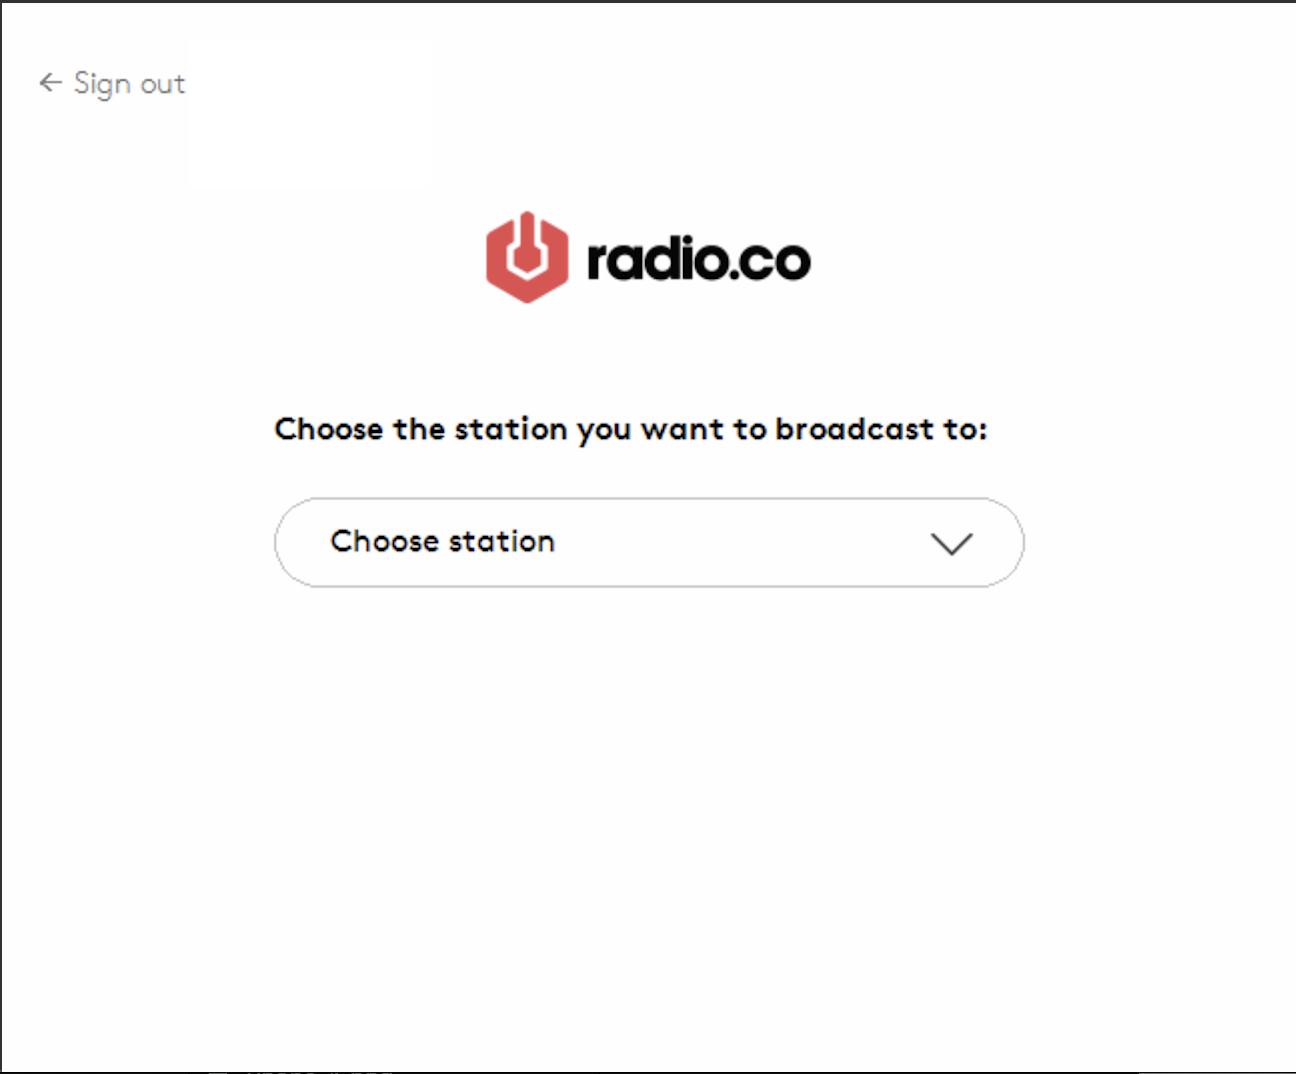 Choosing a Radio.co station.